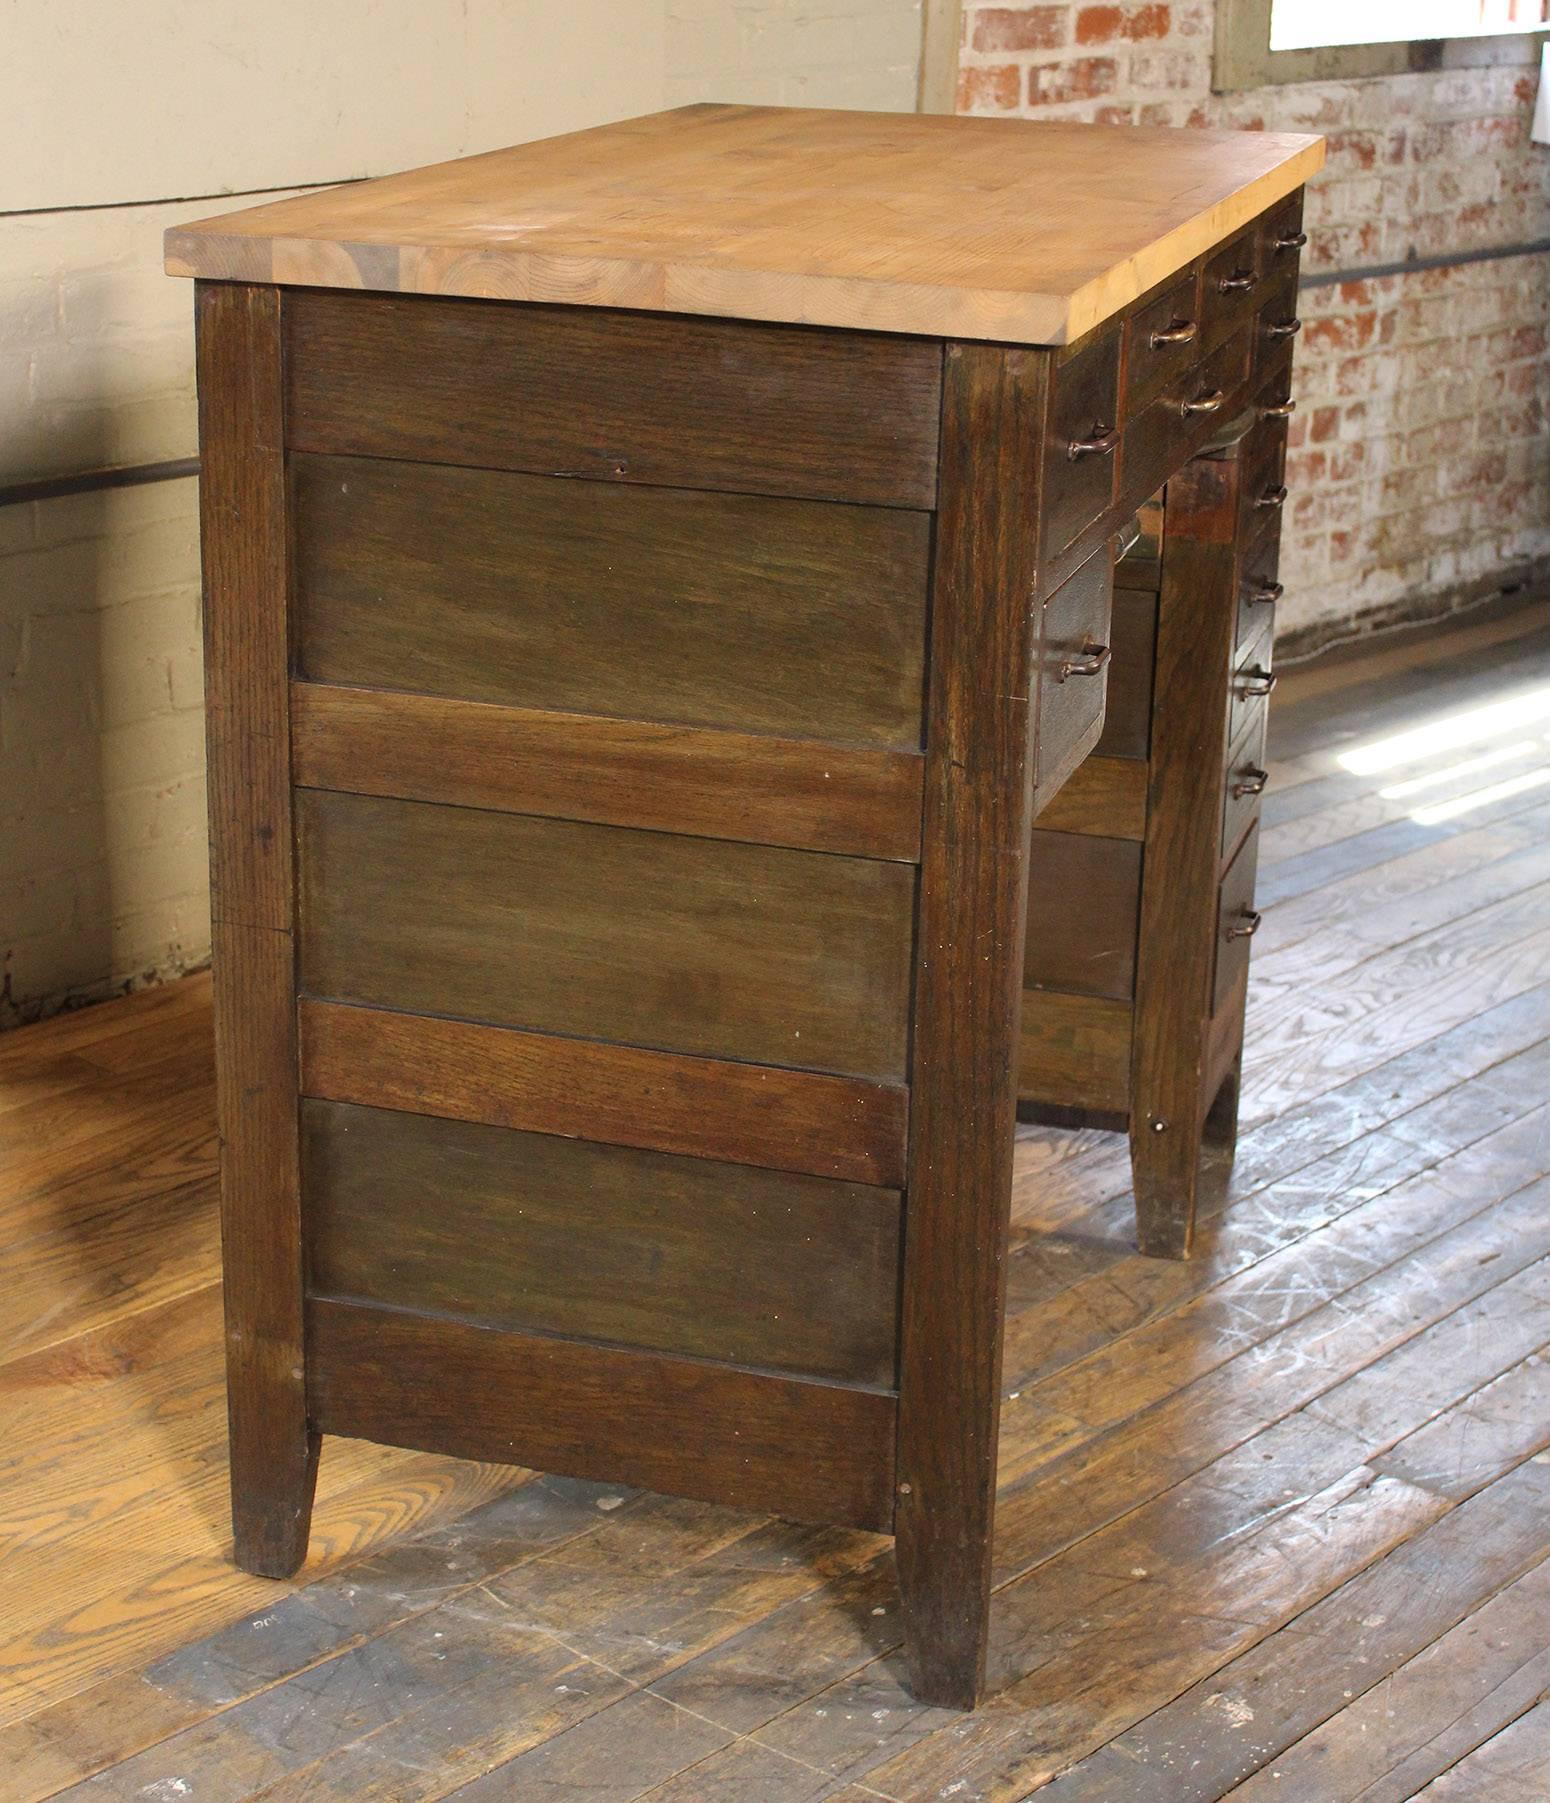 American Jewelers Workbench, Desk, Cabinet, Wooden Vintage Industrial  Storage For Sale